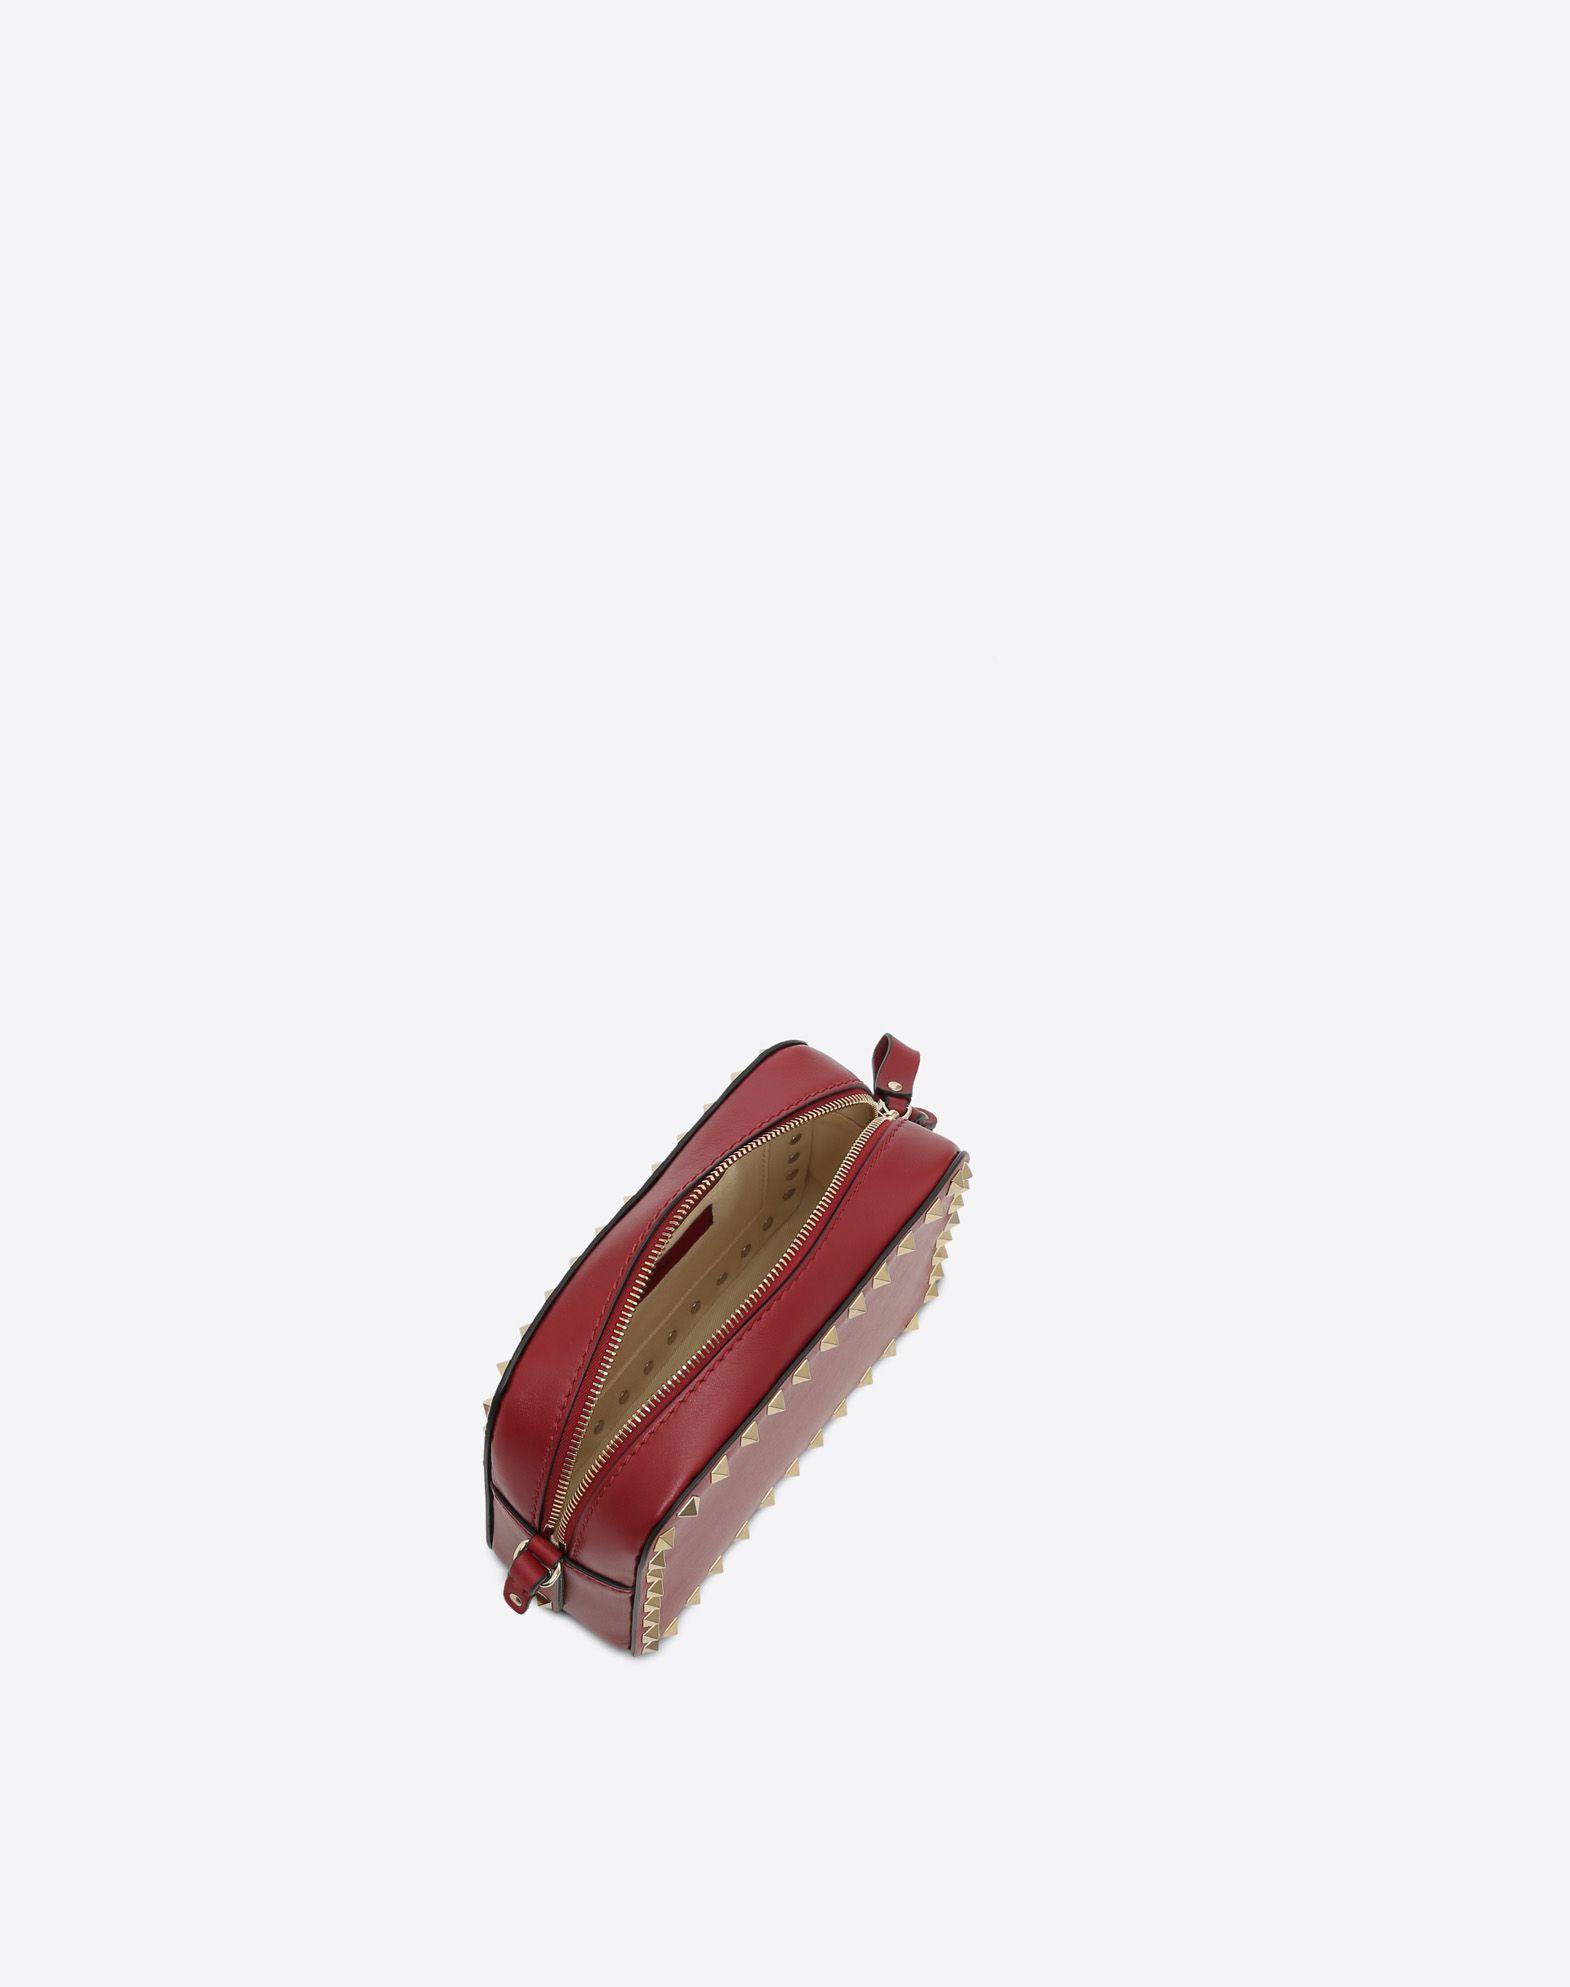 VALENTINO GARAVANI Rockstud Cross-body Bag CROSS BODY BAG D e